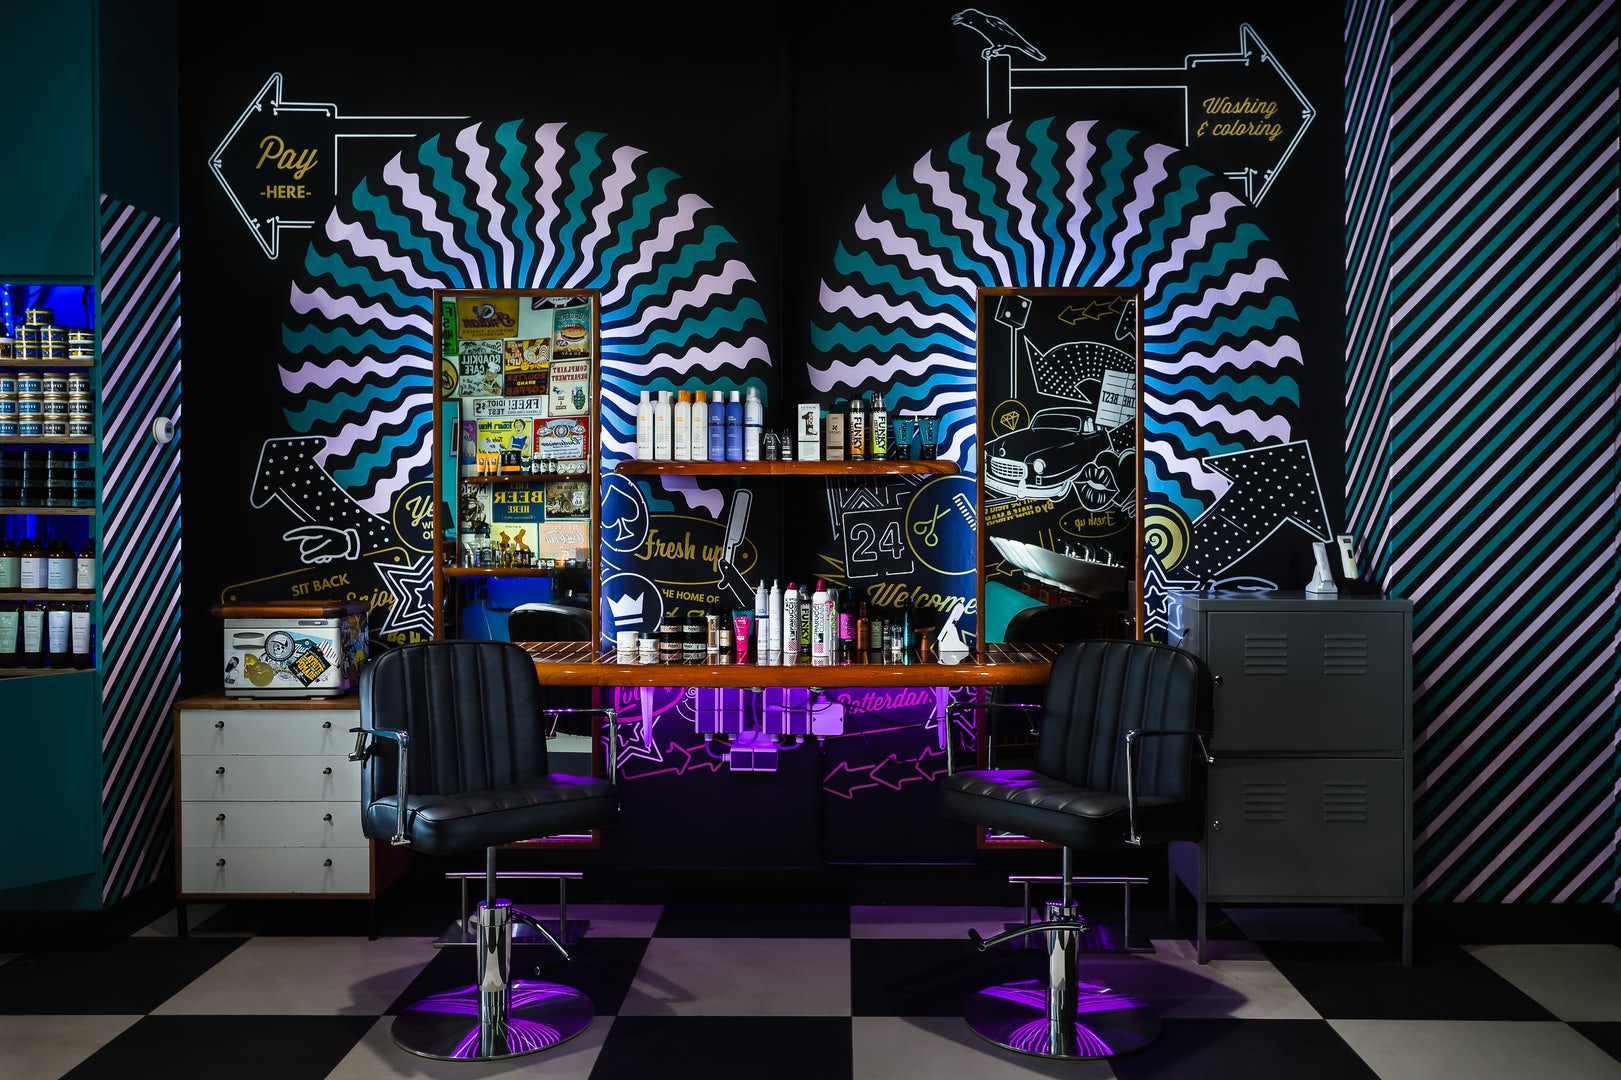 interior of Mudly's Barbershop